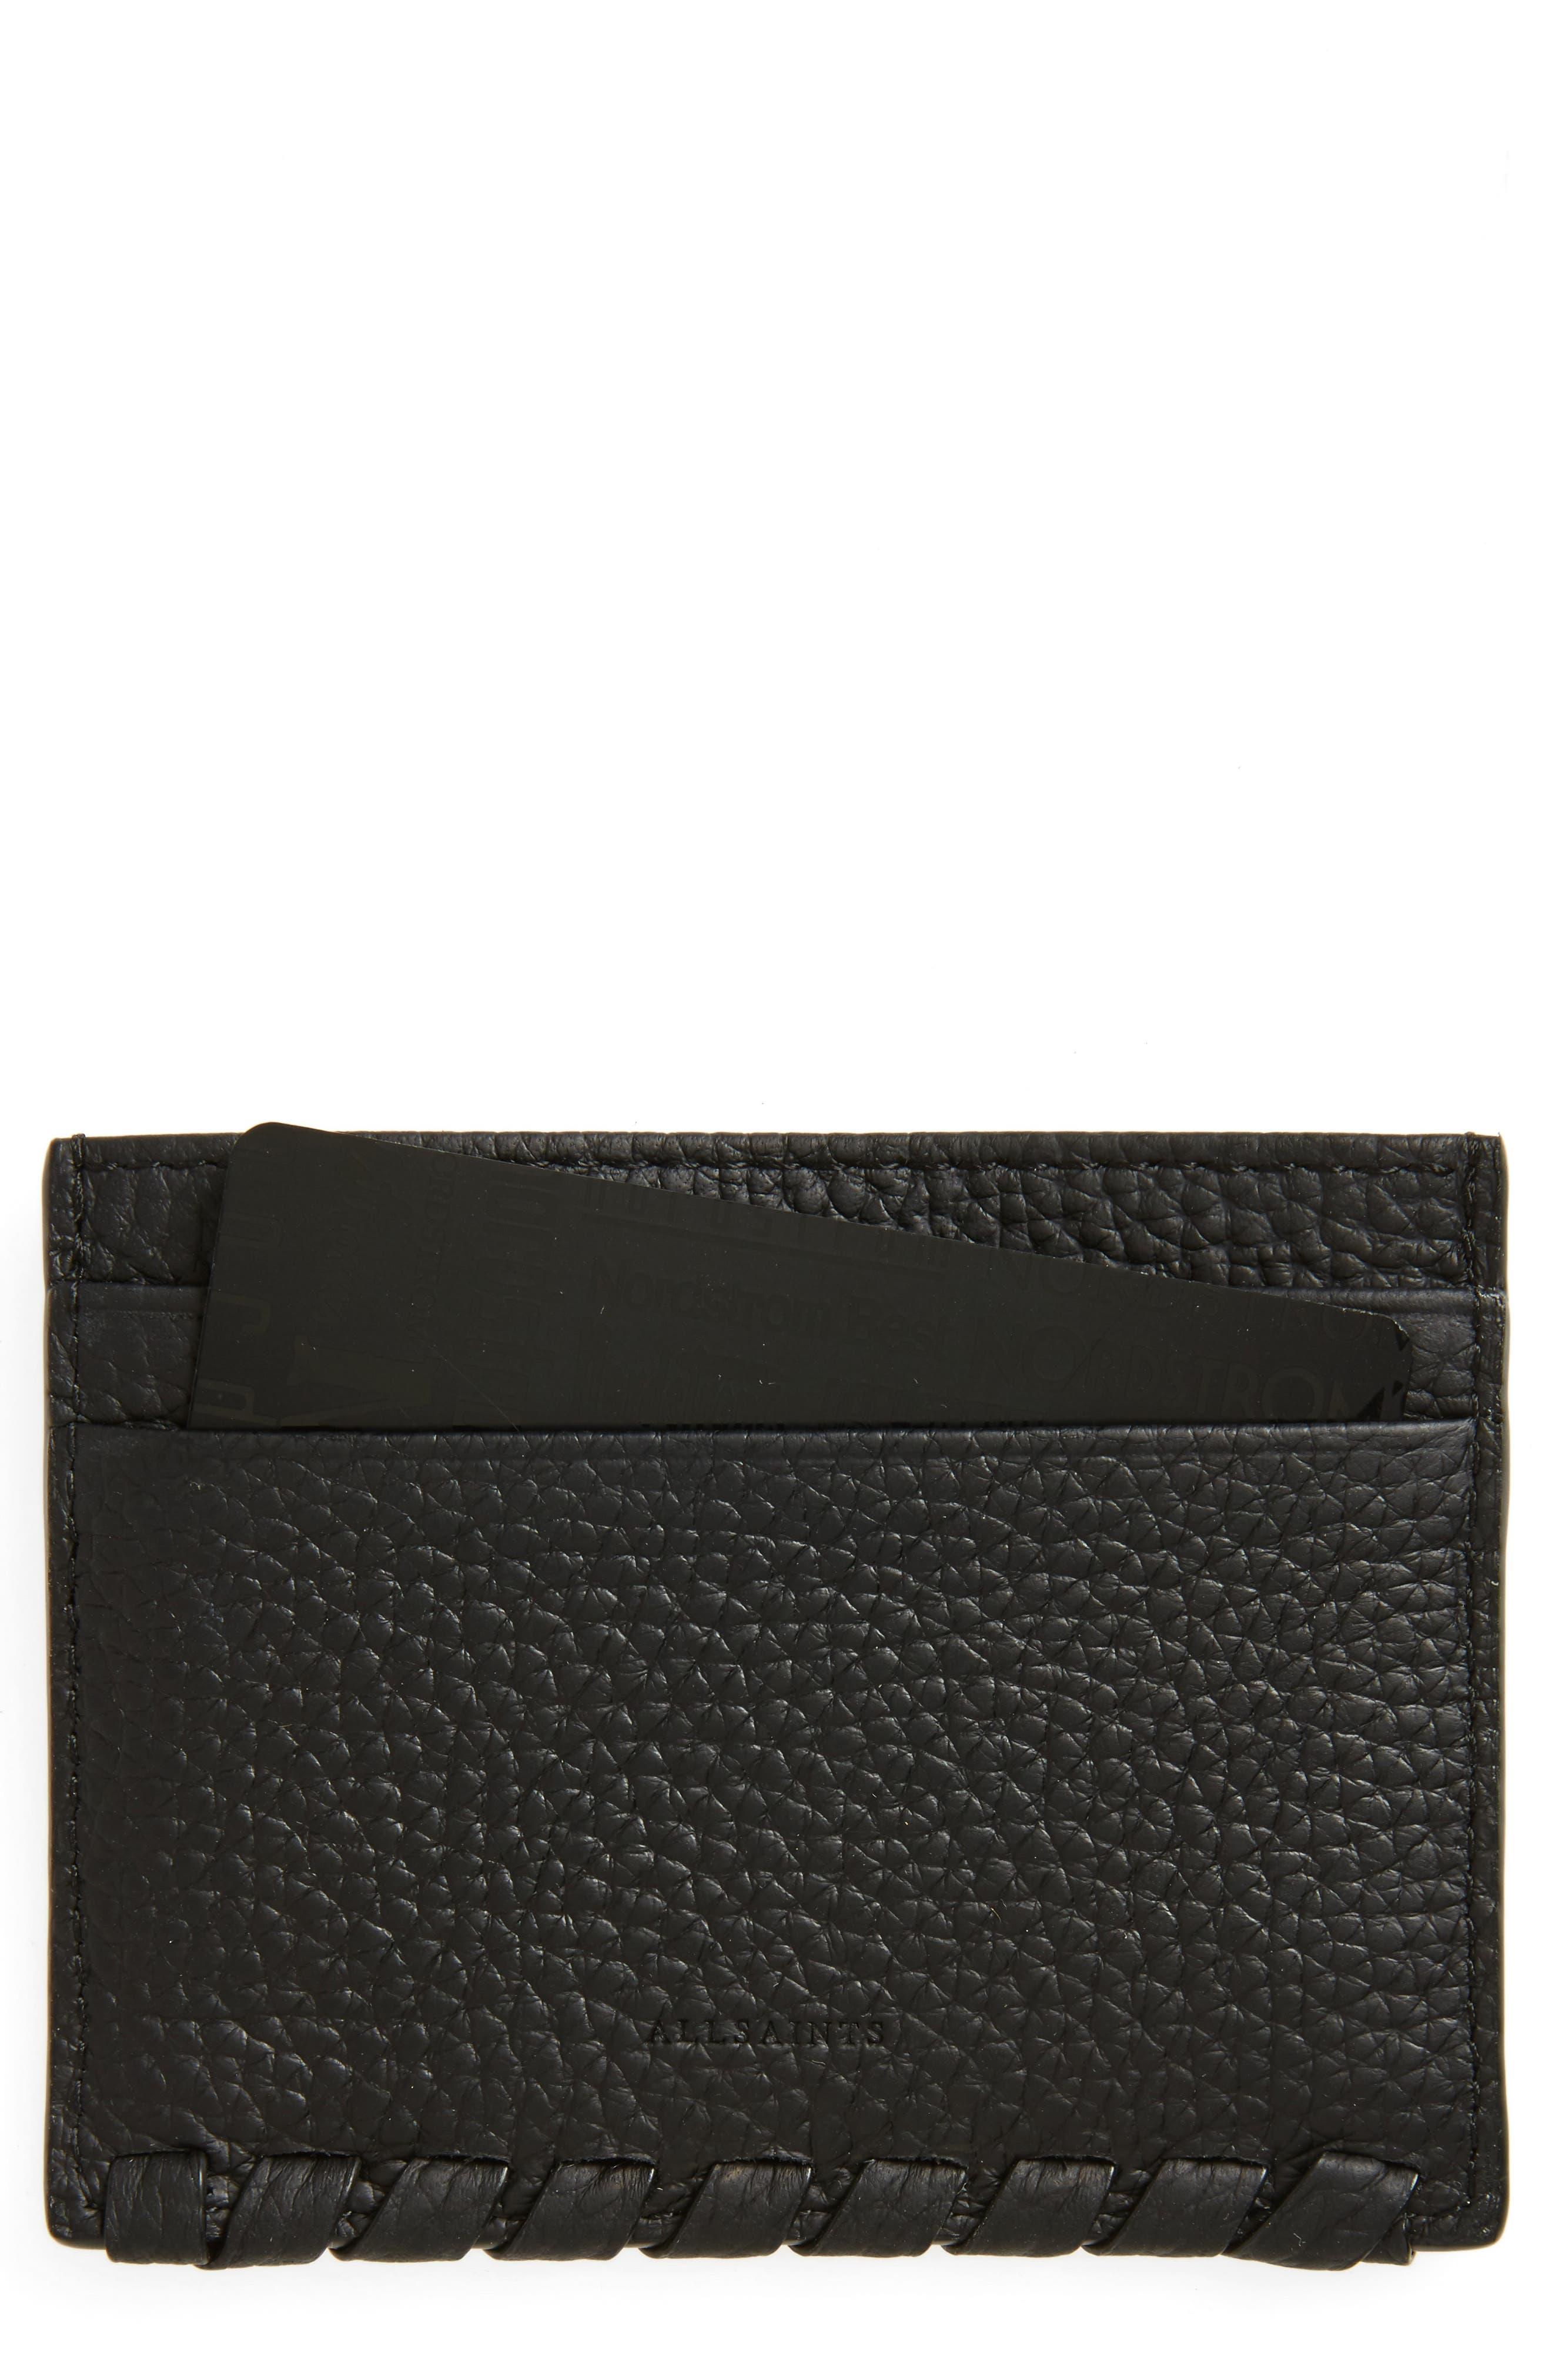 Kita Pebbled Leather Card Case,                         Main,                         color, 001